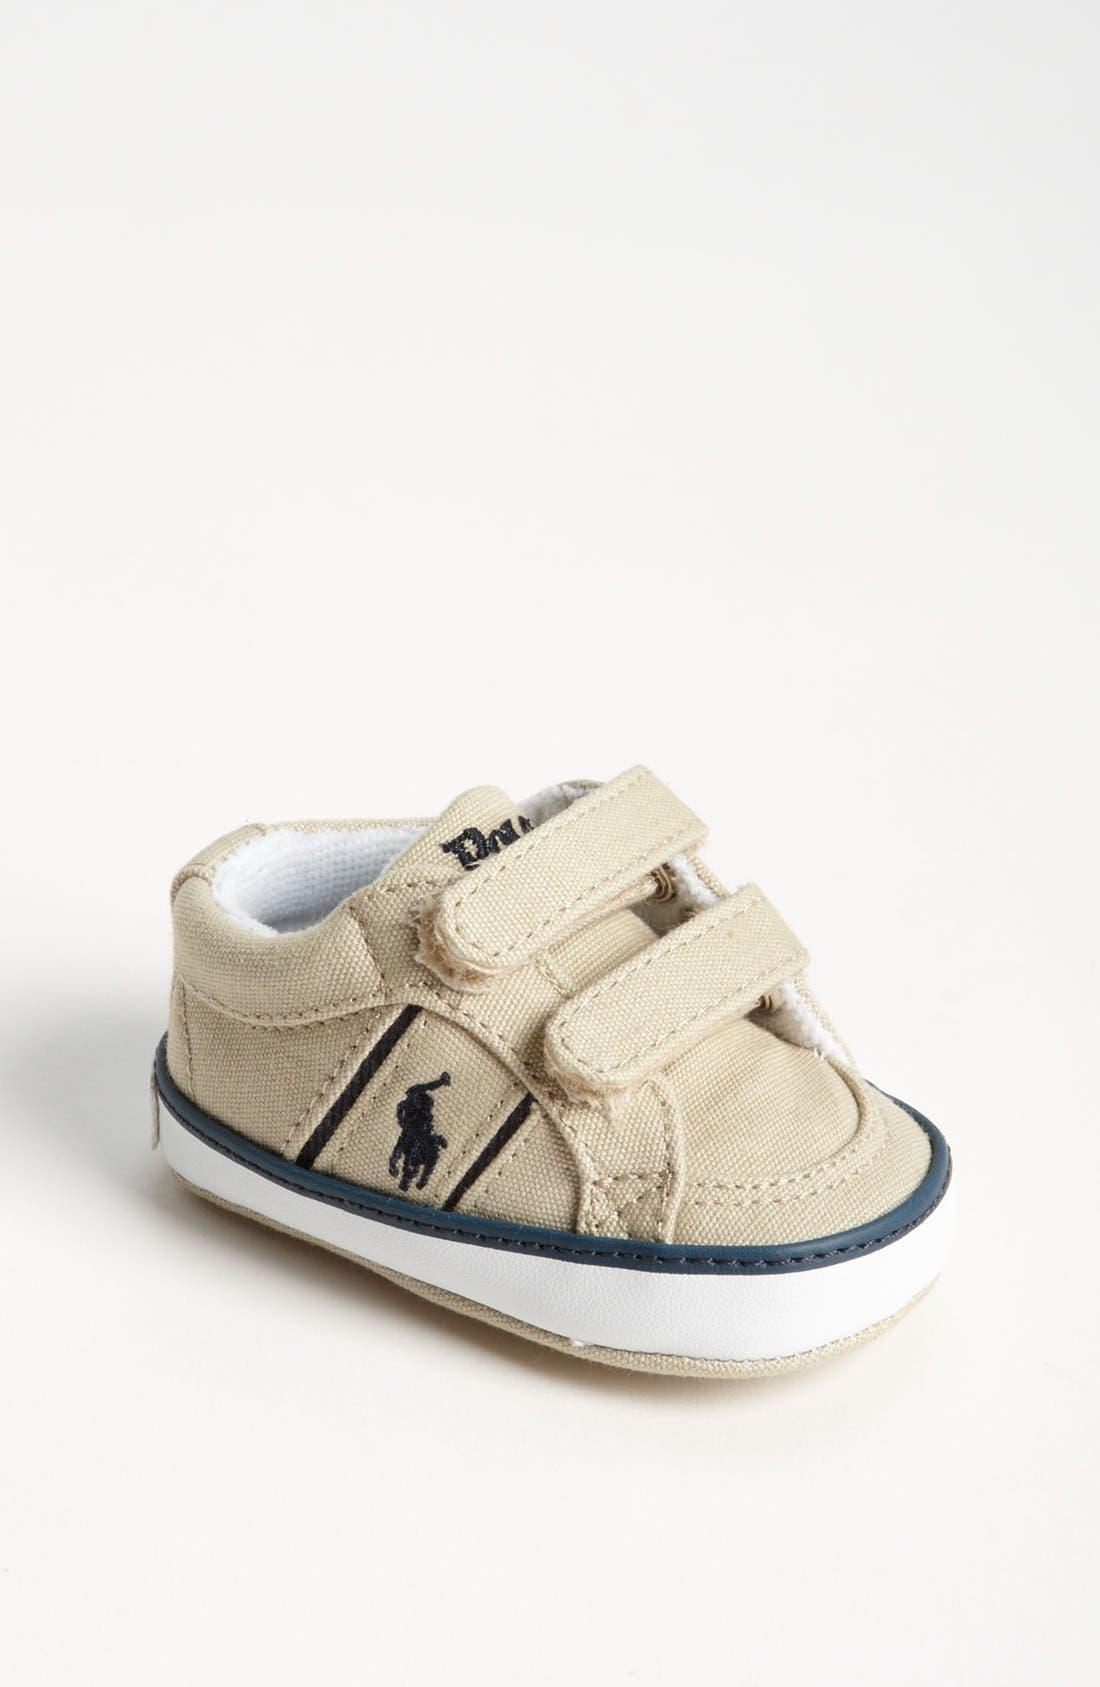 Alternate Image 1 Selected - Ralph Lauren Layette Crib Shoe (Baby)